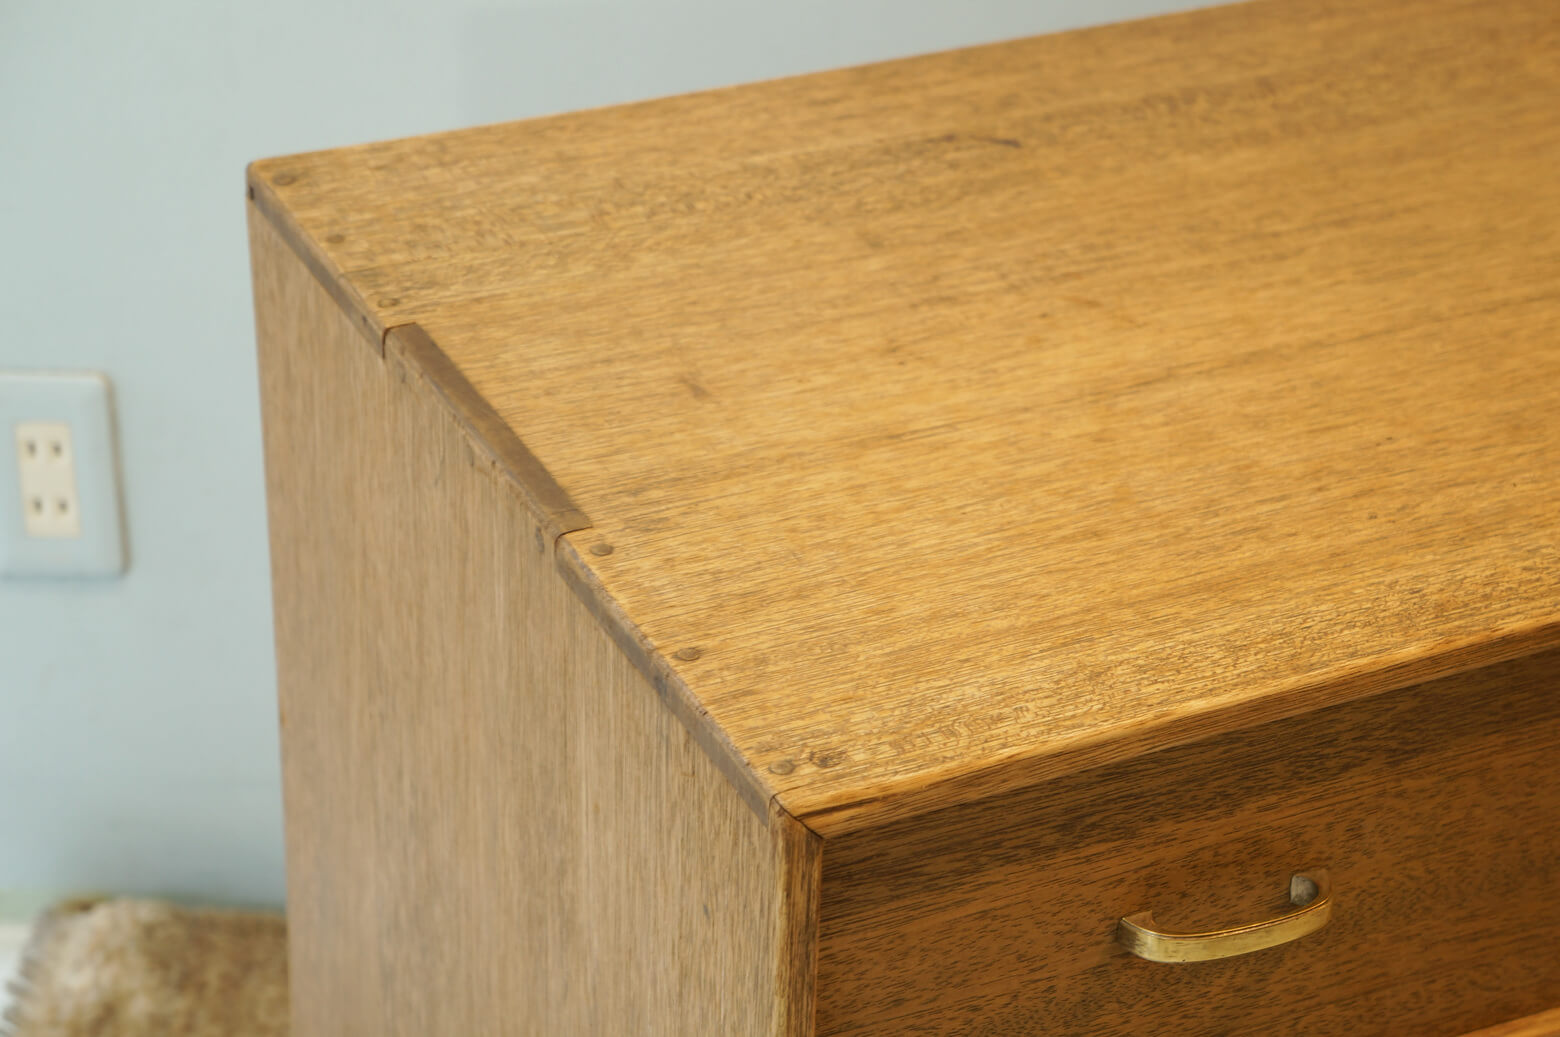 Japanese Vintage Drawer Chest/昭和レトロ チェスト 箪笥 引き出し 和家具 古道具